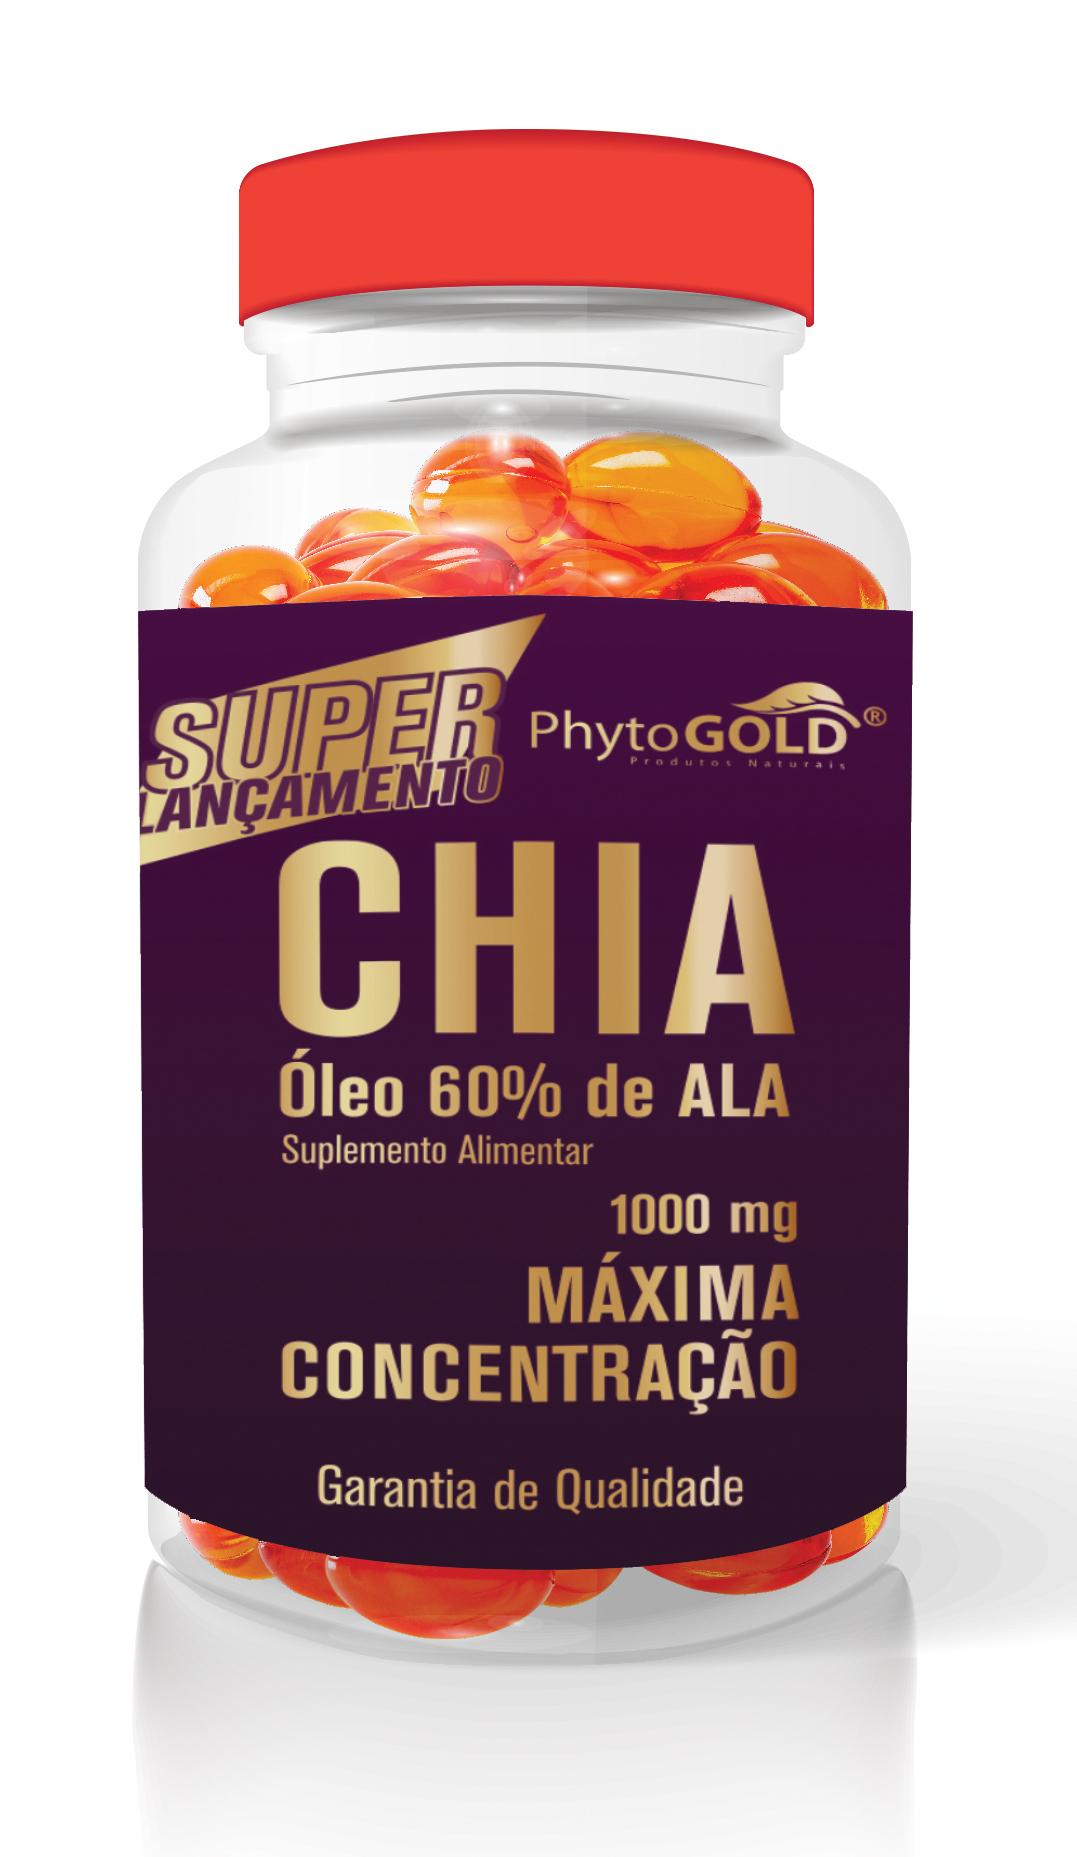 CHIA - Óleo de Chia 1000 mg